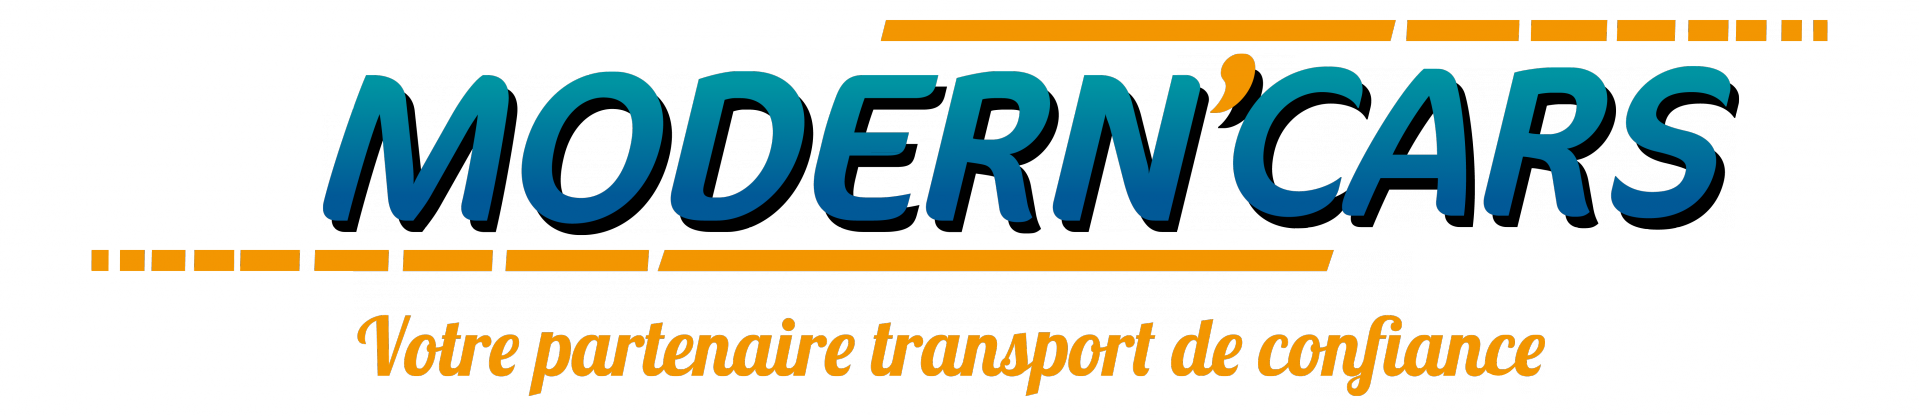 Logo Modern Cars